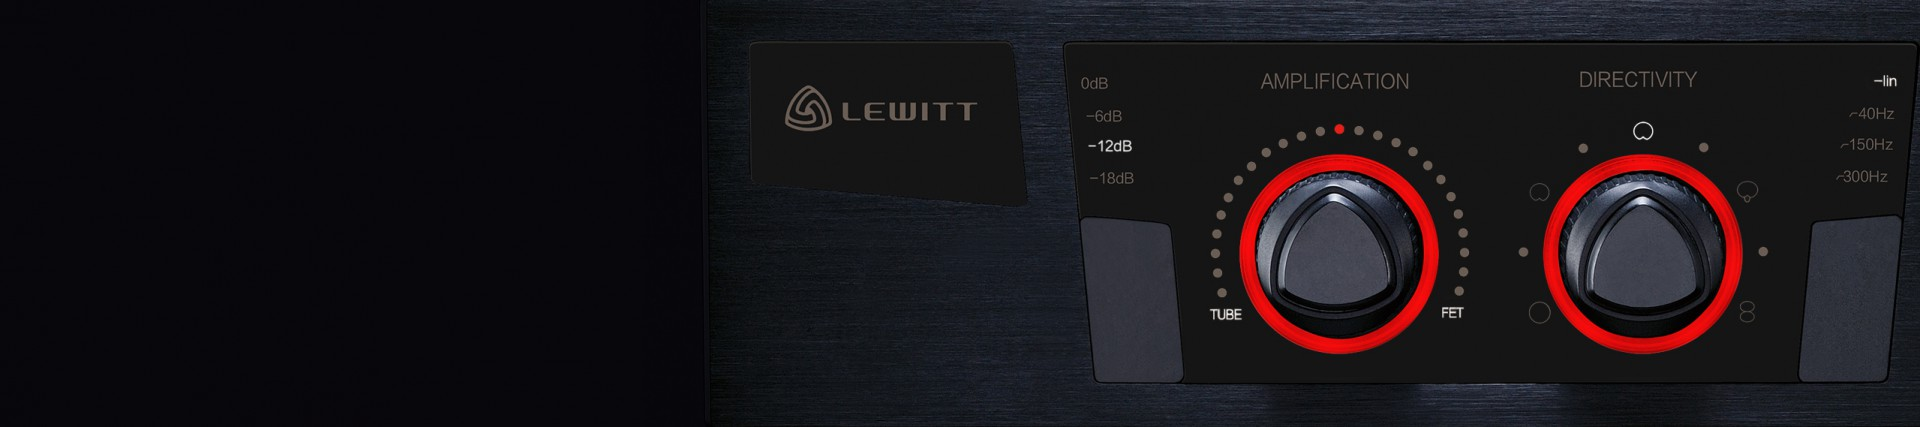 20170216_lewitt_screen05-lewitt-lct940-black-hirez-04-2912-04